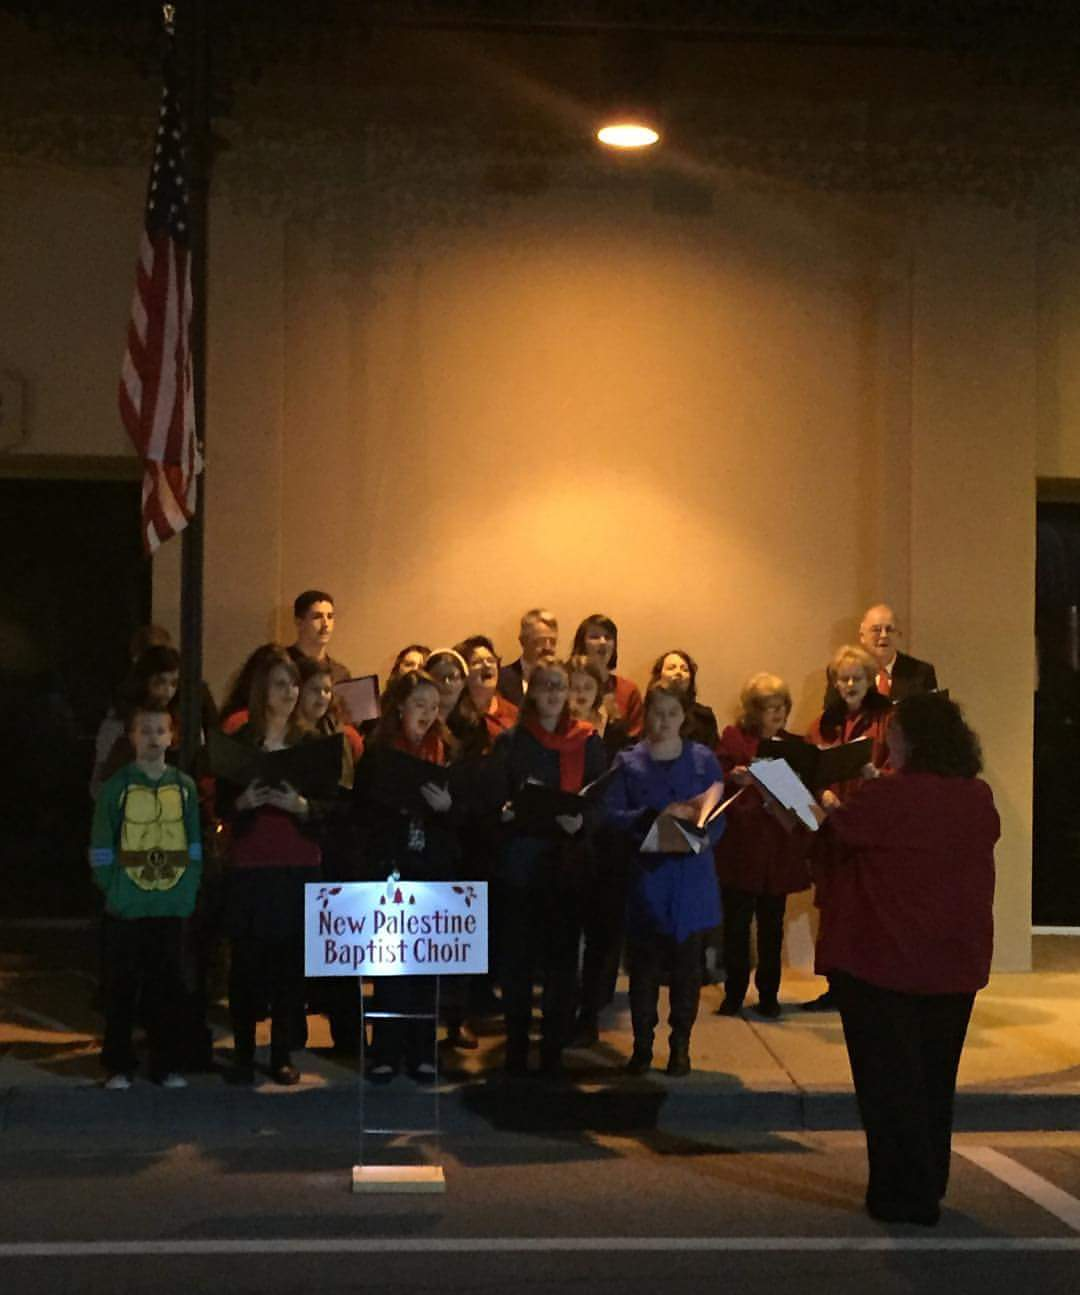 New Palestine Baptist Choir